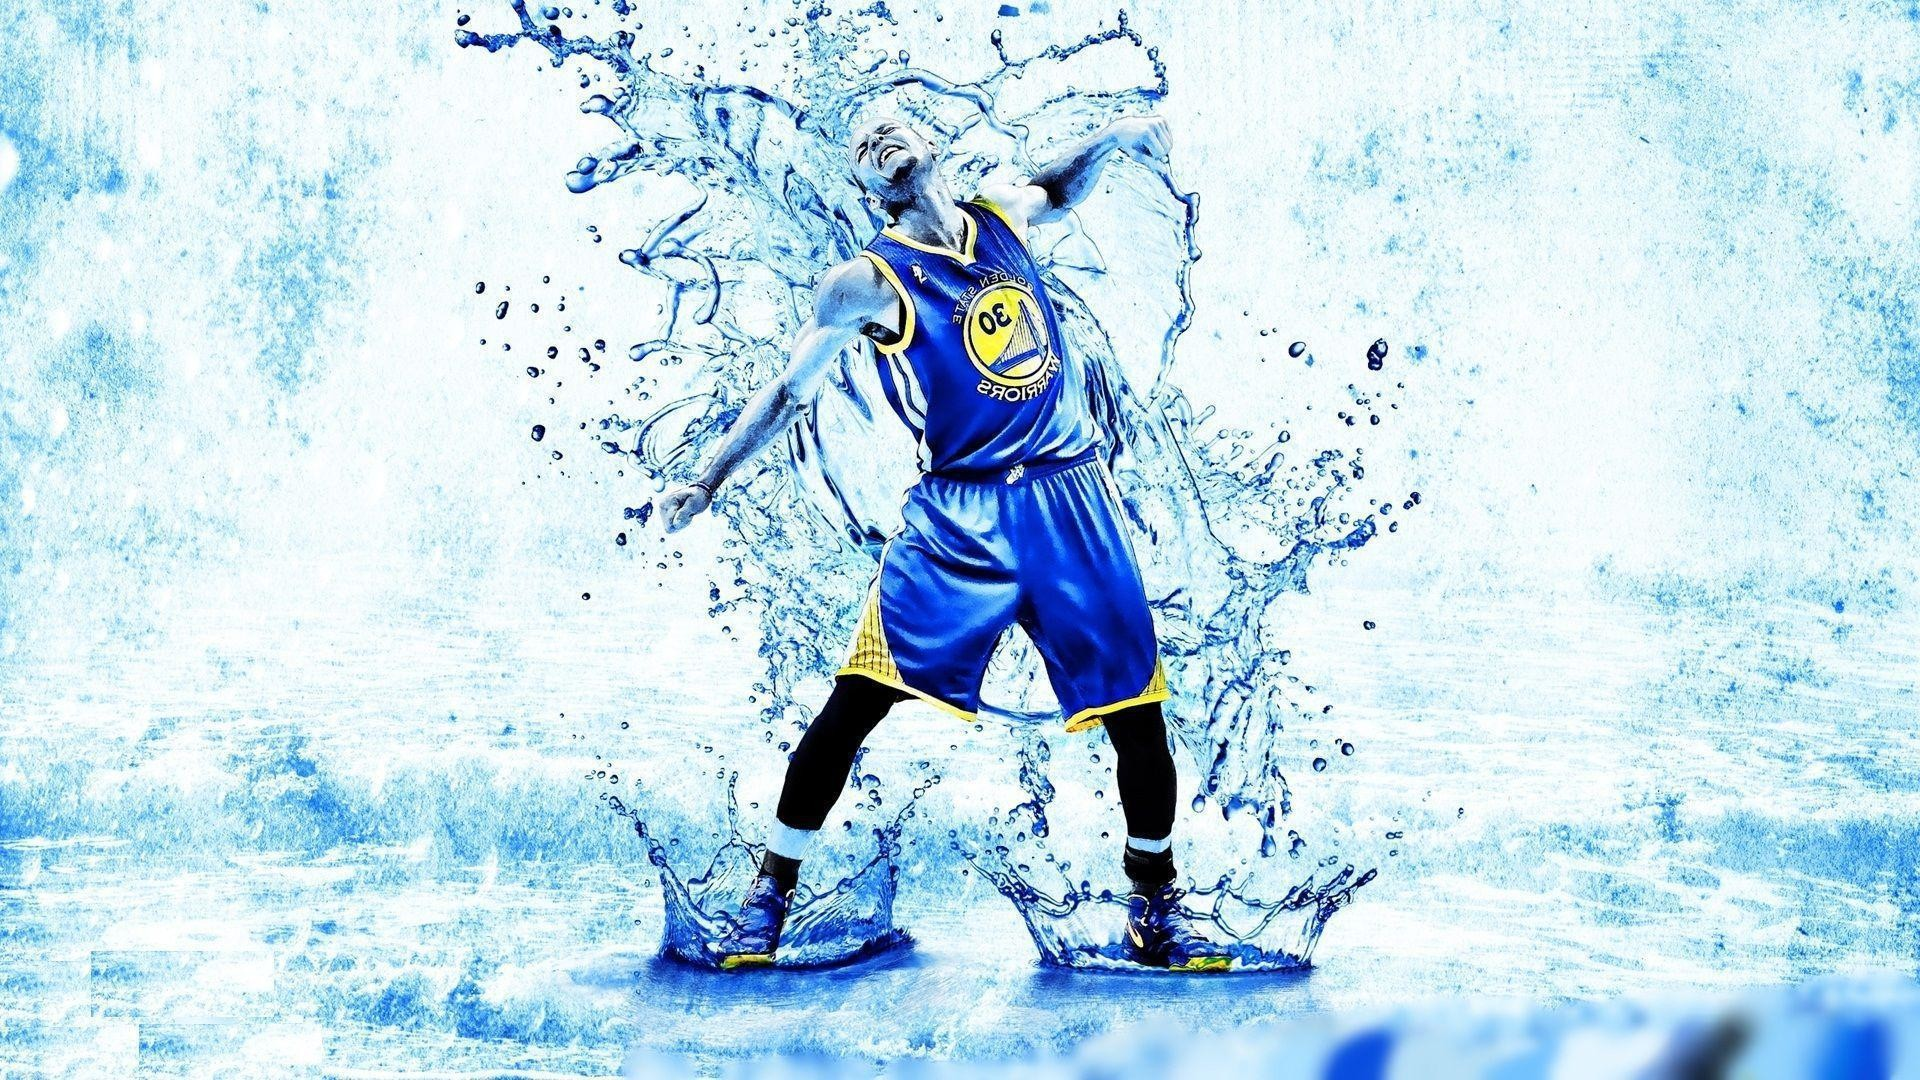 Stephen Curry Splash Wallpaper 83 Images